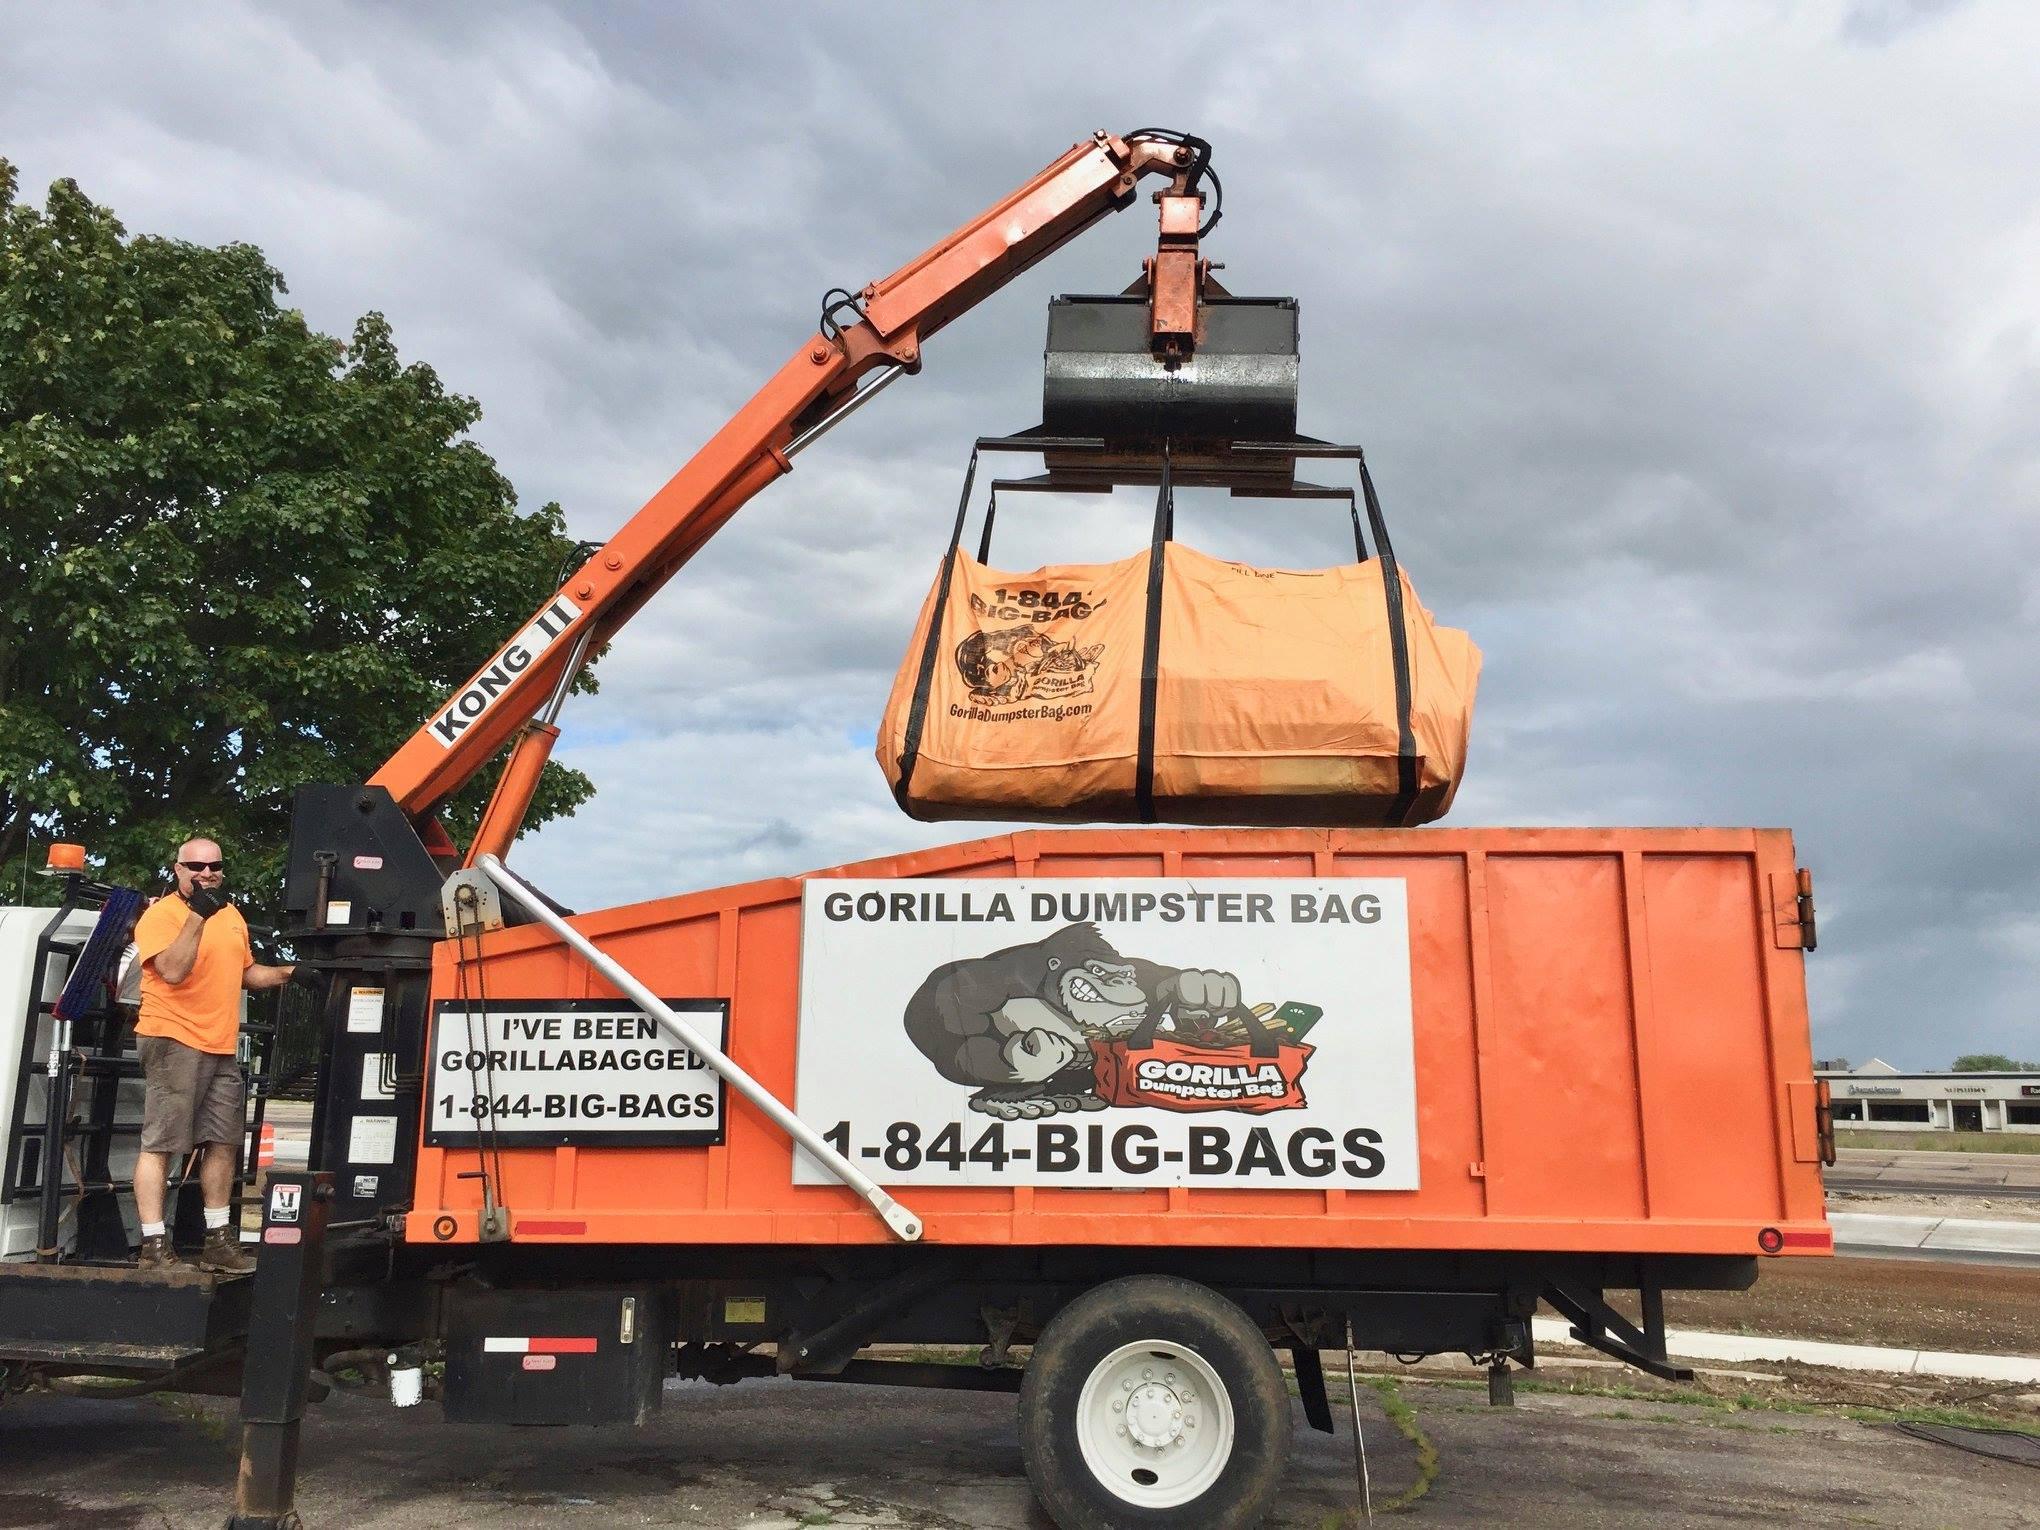 Gorilla Dumpster Bag